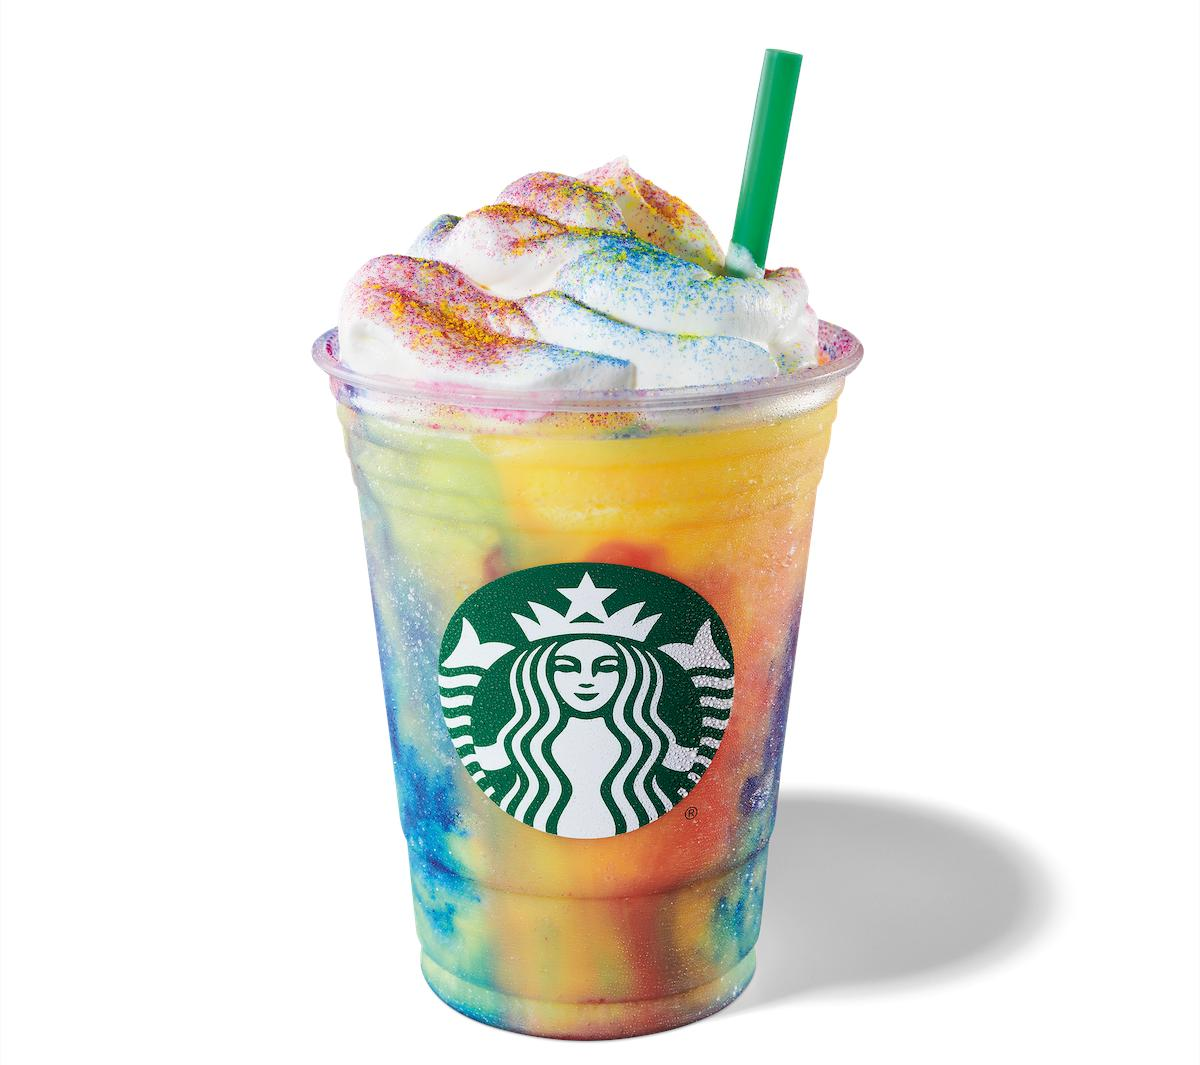 Starbucks Launches New Tie Dye Frappuccino(R) Blended Beverage @StarbucksCanada Starbucks Launches New Tie Dye Frappuccino(R) Blended Beverage - https://t.co/NozMaeIH3W https://t.co/1Lo6eIh8SA